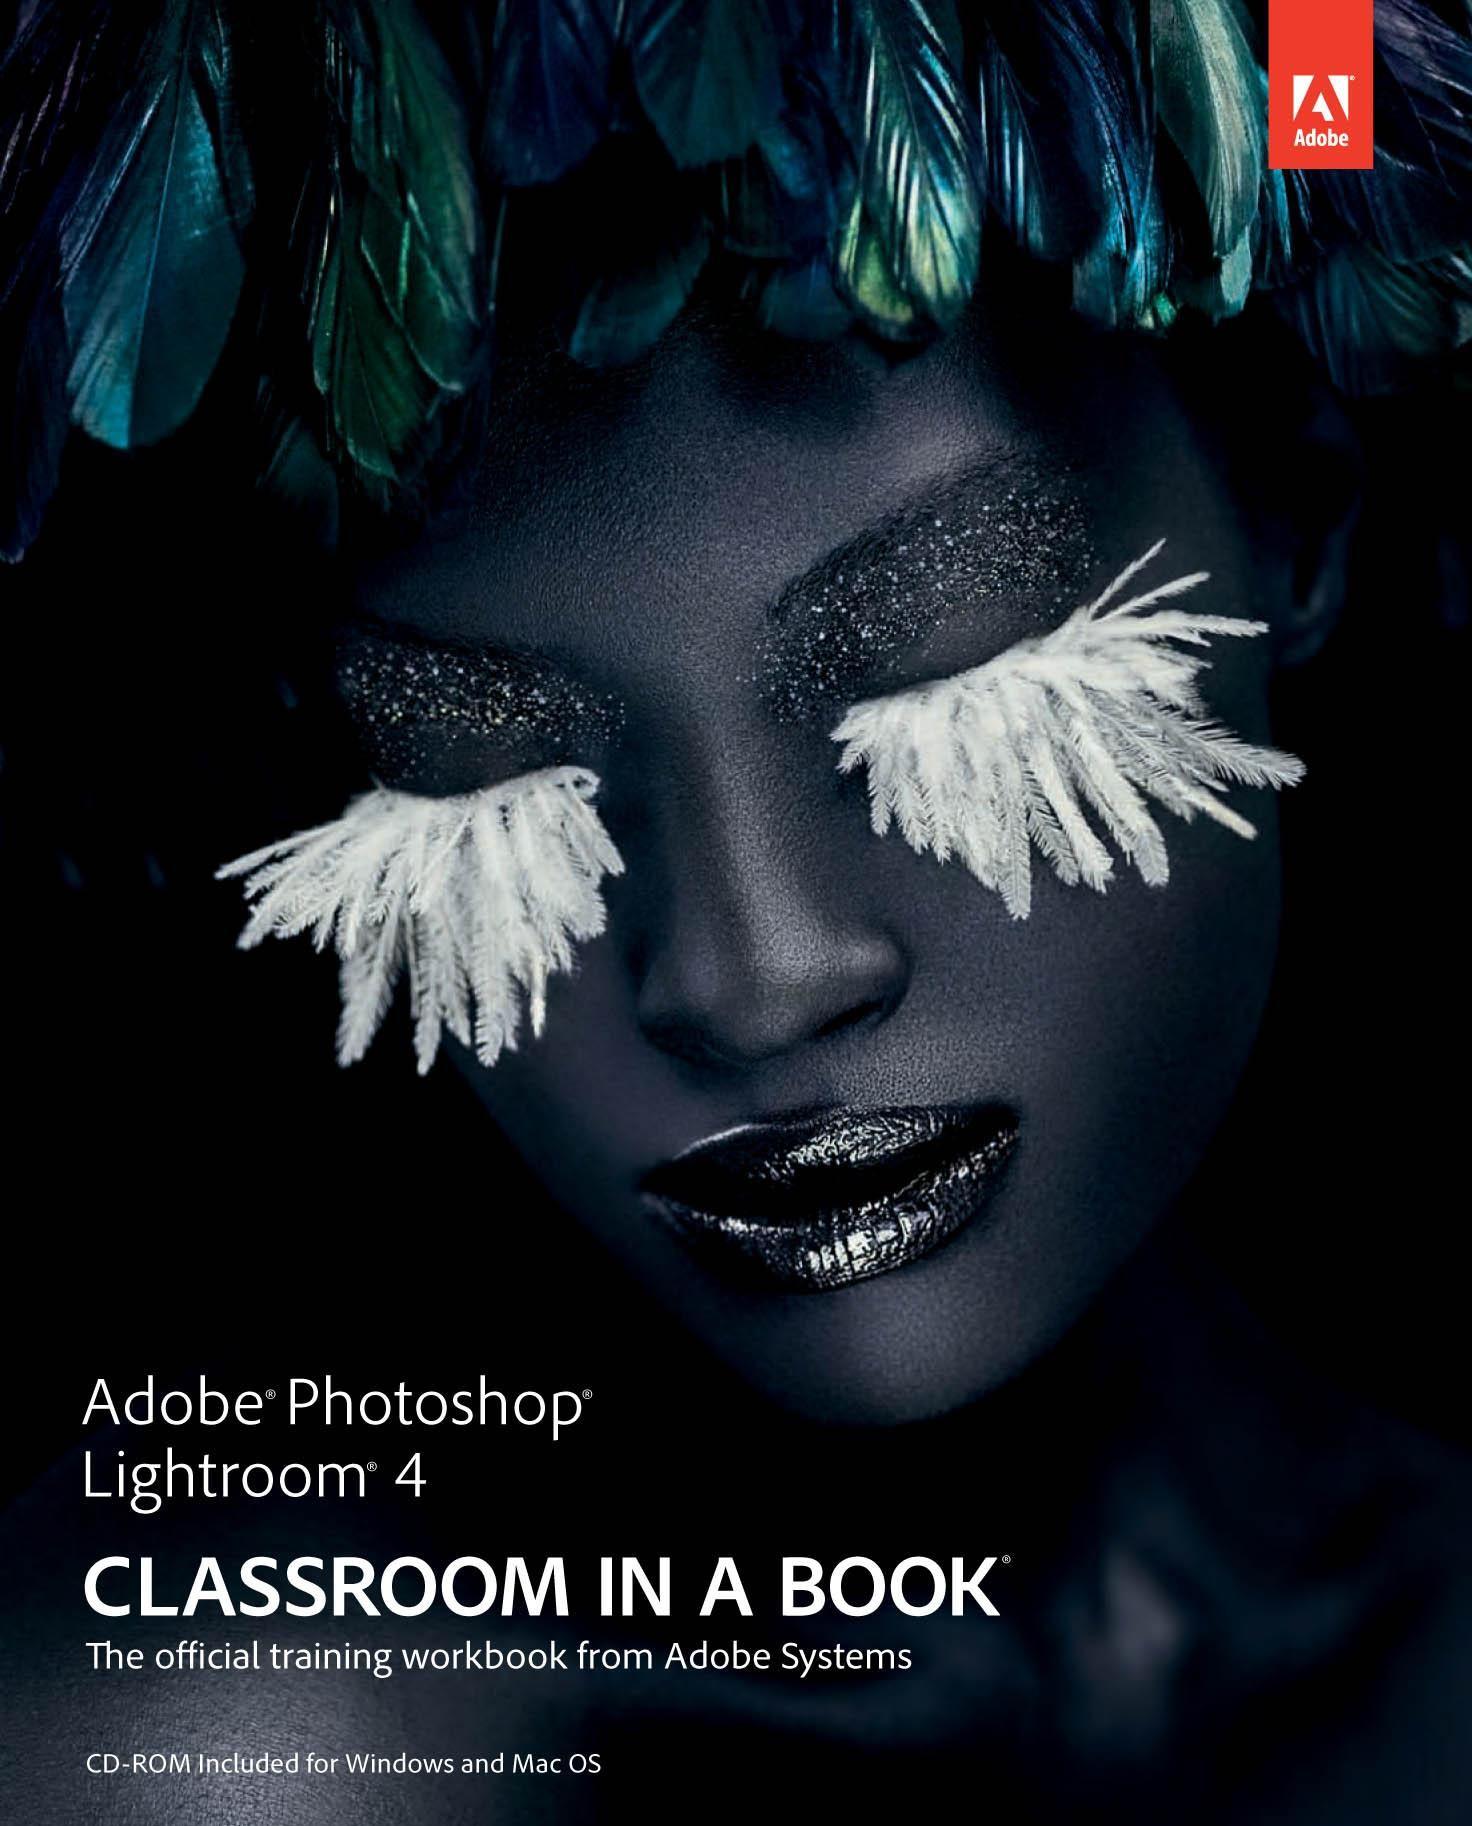 Adobe Photoshop Lightroom 4 + For Mac/Windows + NYU Price